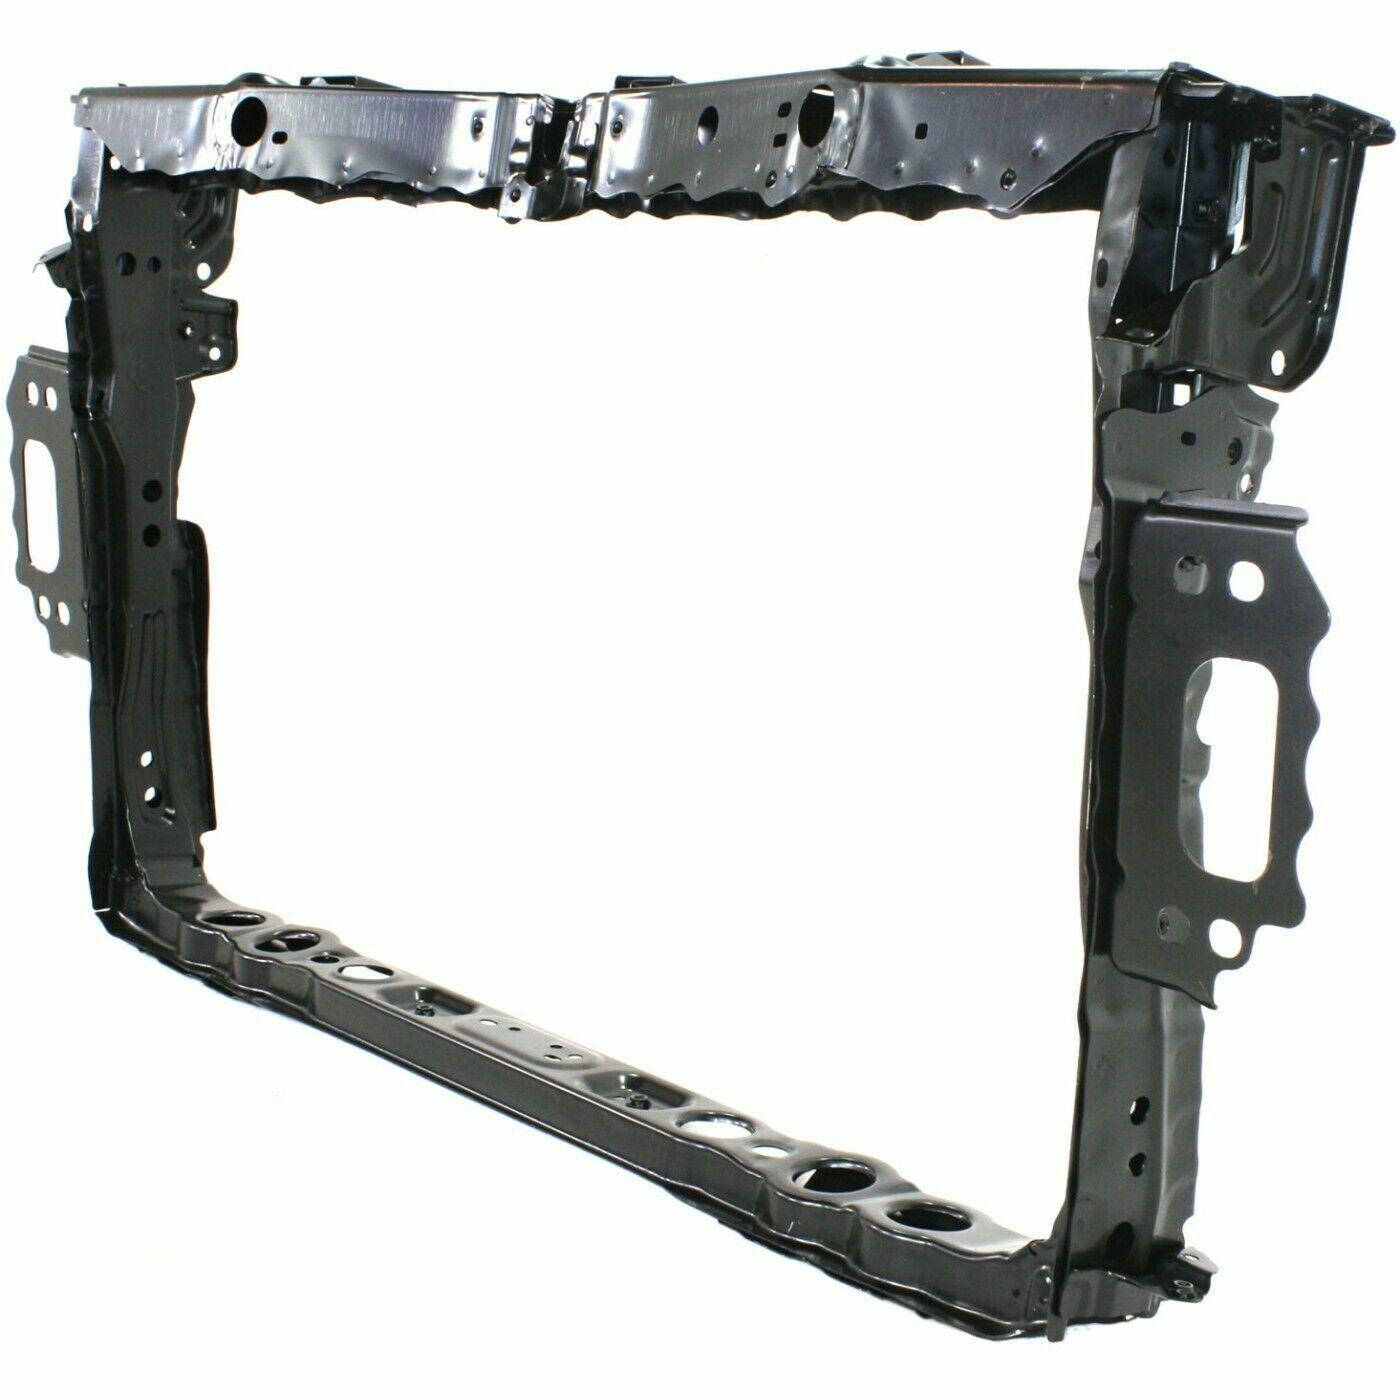 Auto Parts and Vehicles Car & Truck Radiators & Parts NEW FRONT ...